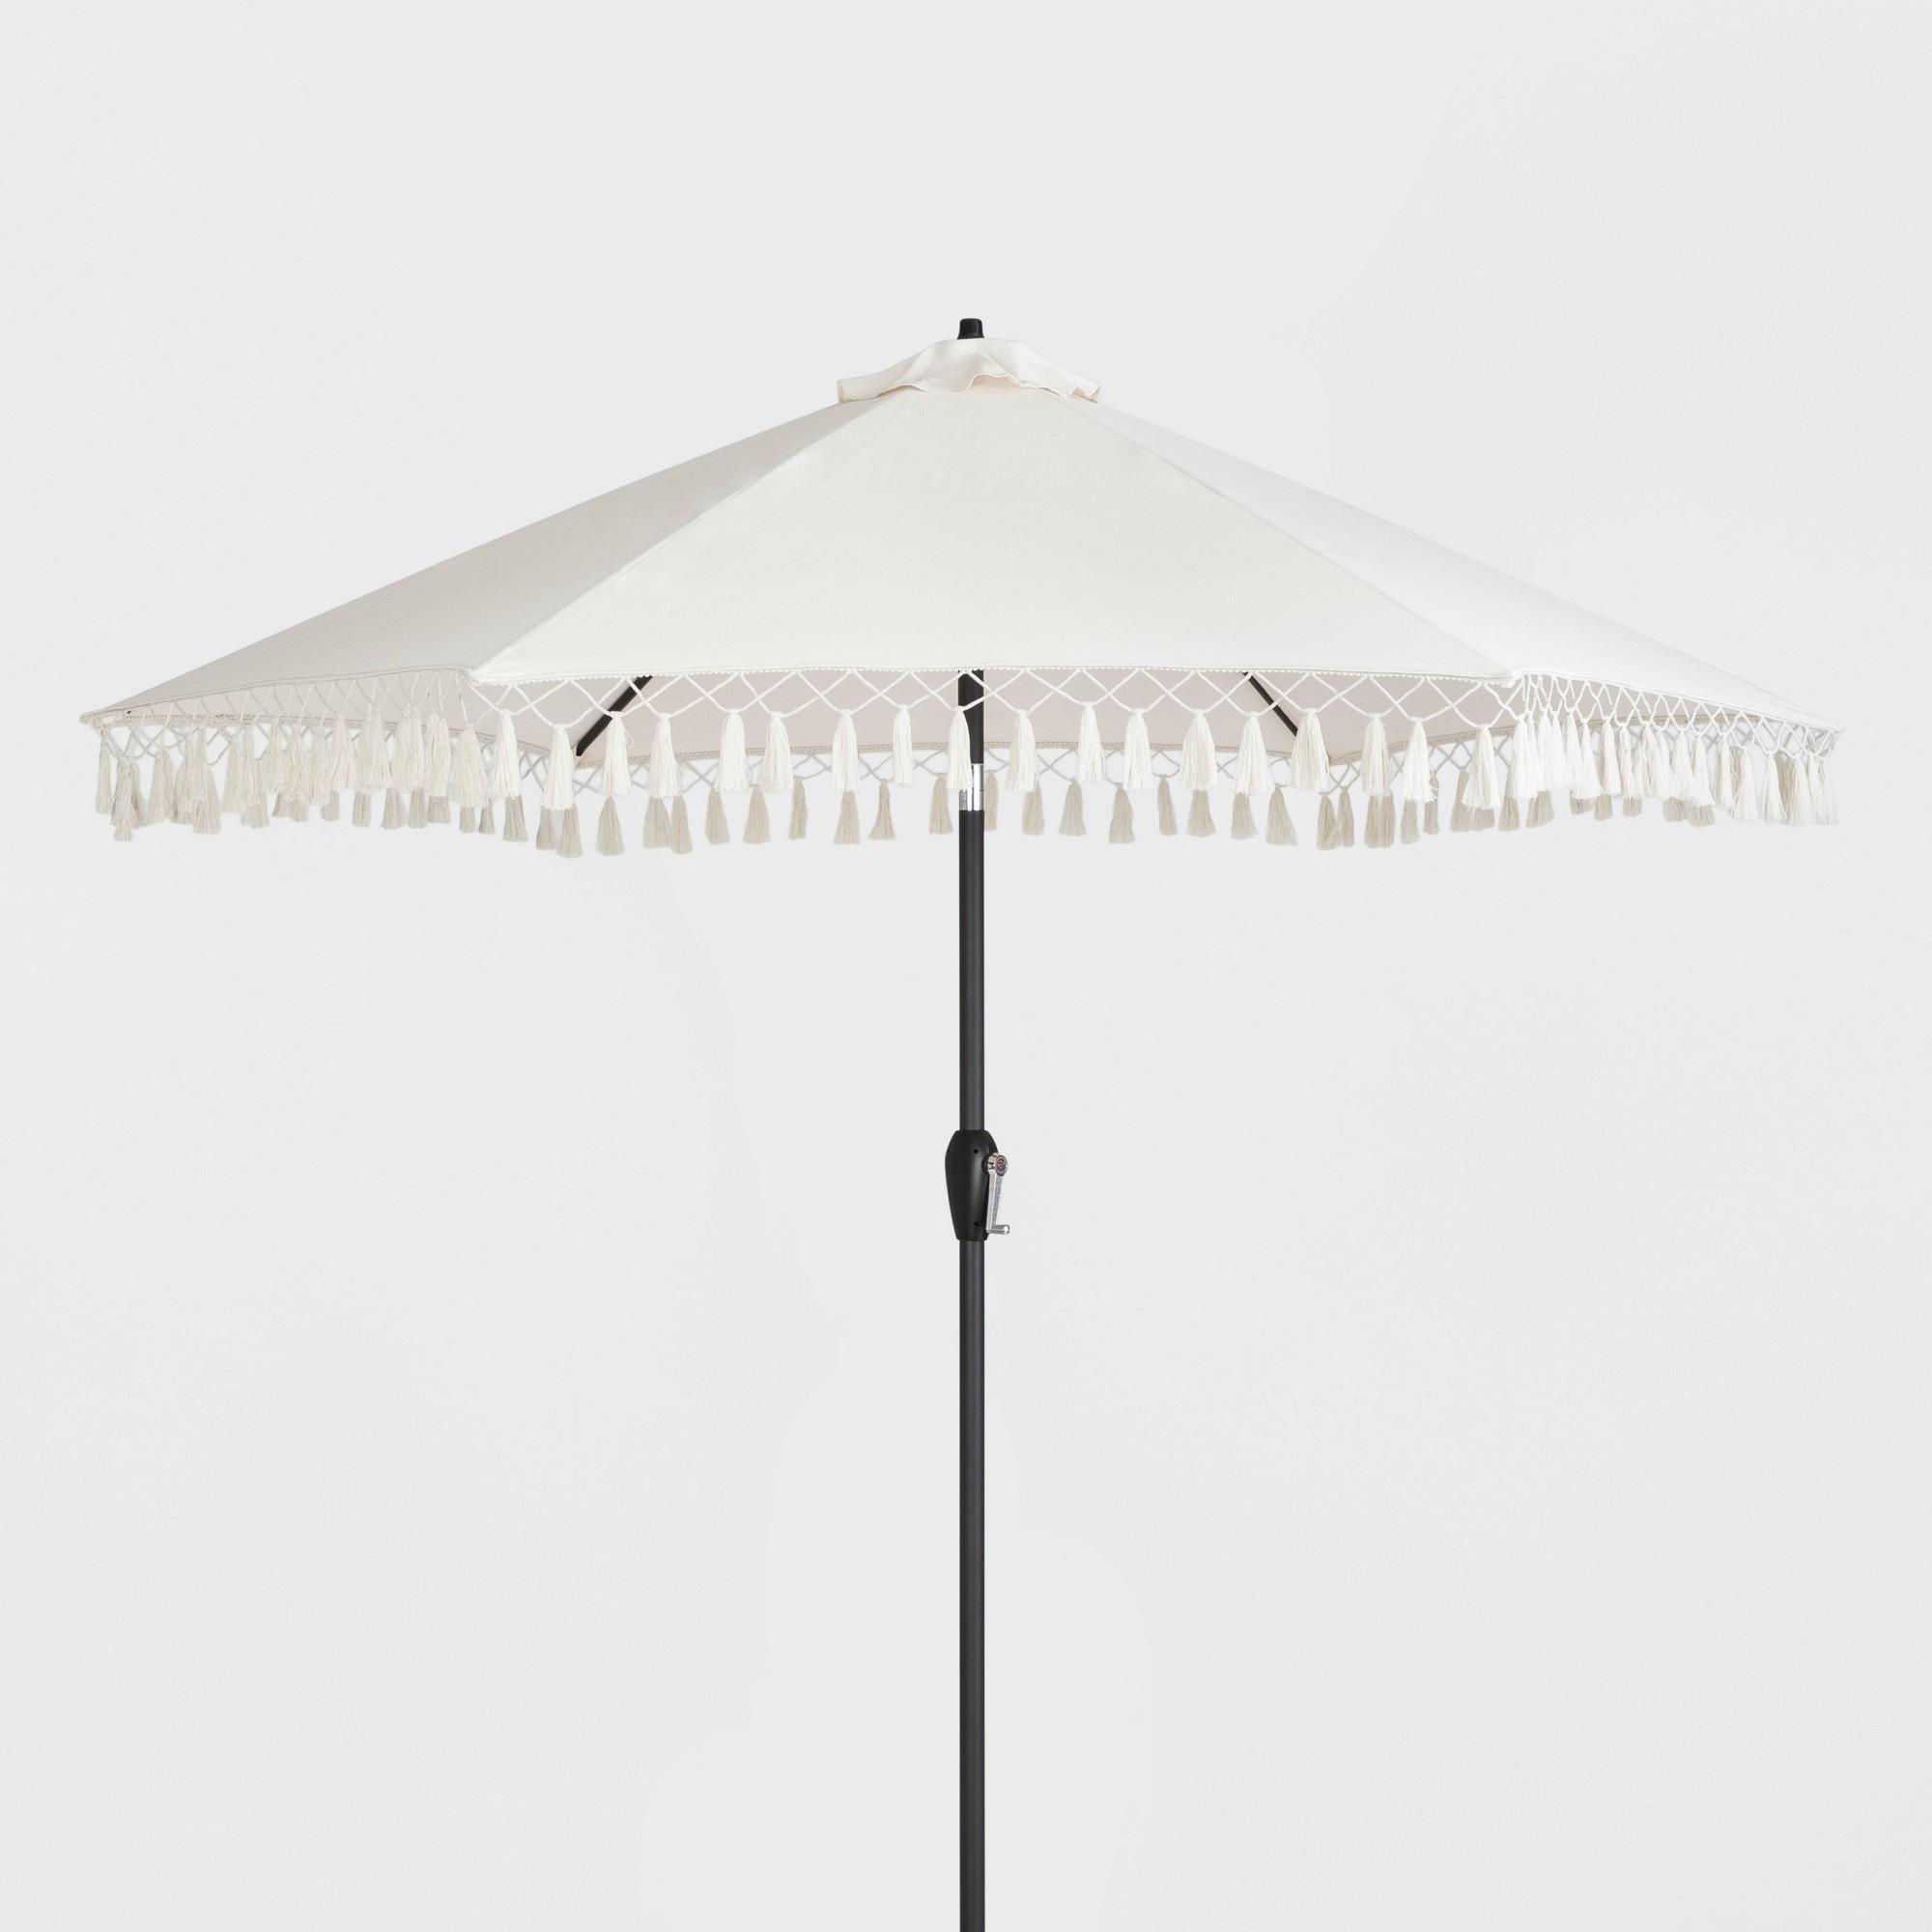 Most Recent Patio Umbrellas With Fringe Throughout 9' Patio Umbrella With Fringe – Beige – Opalhouse (View 9 of 20)